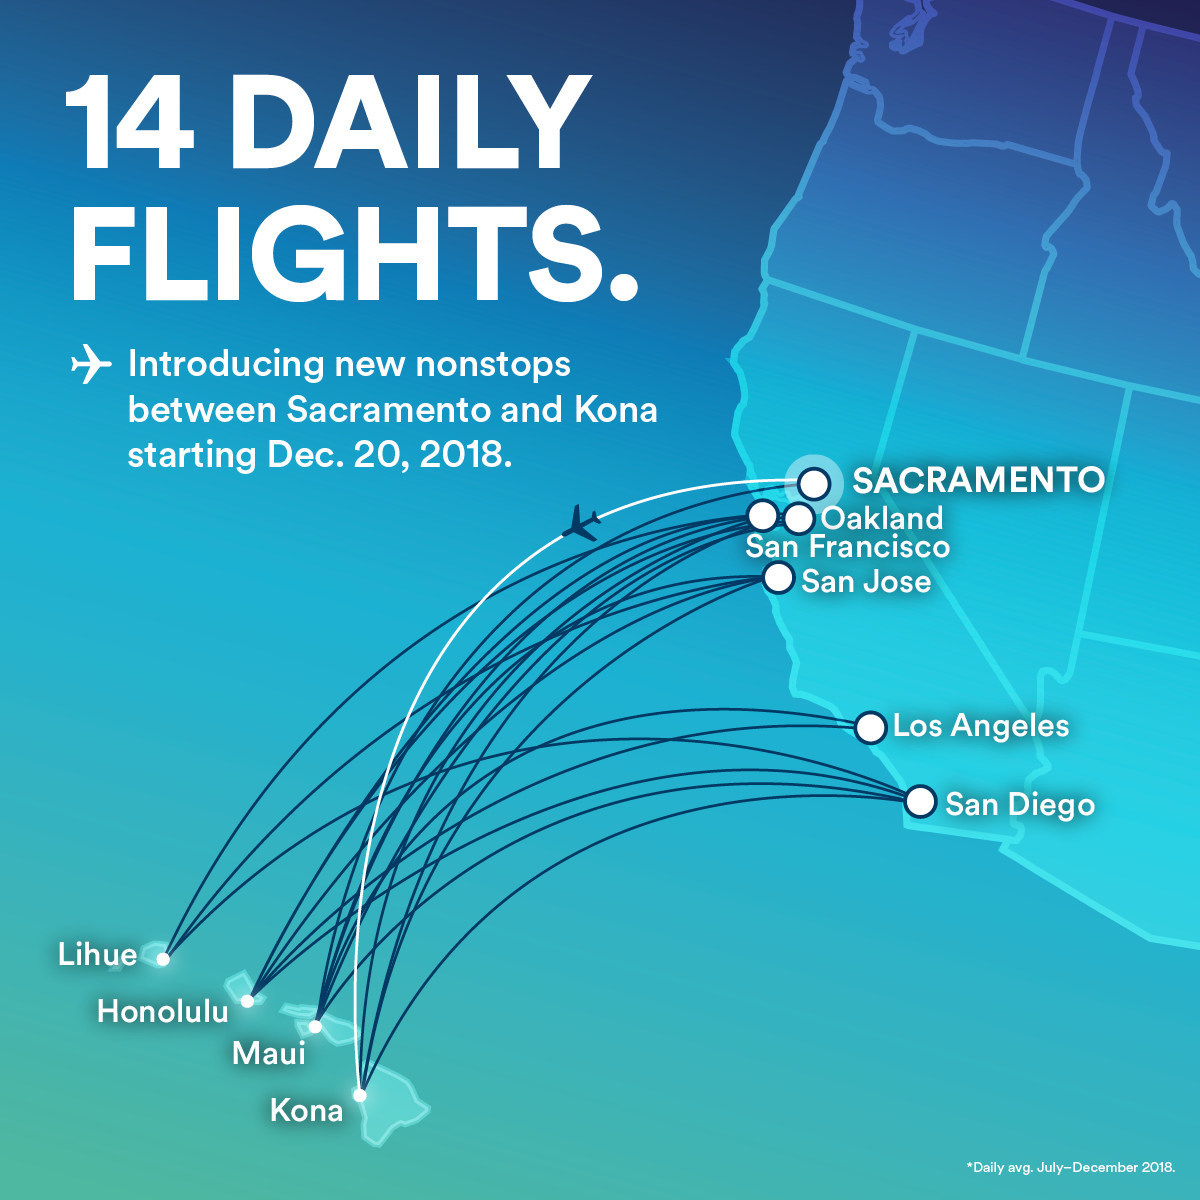 Alaska Airlines Announces New Nonstop Service Between